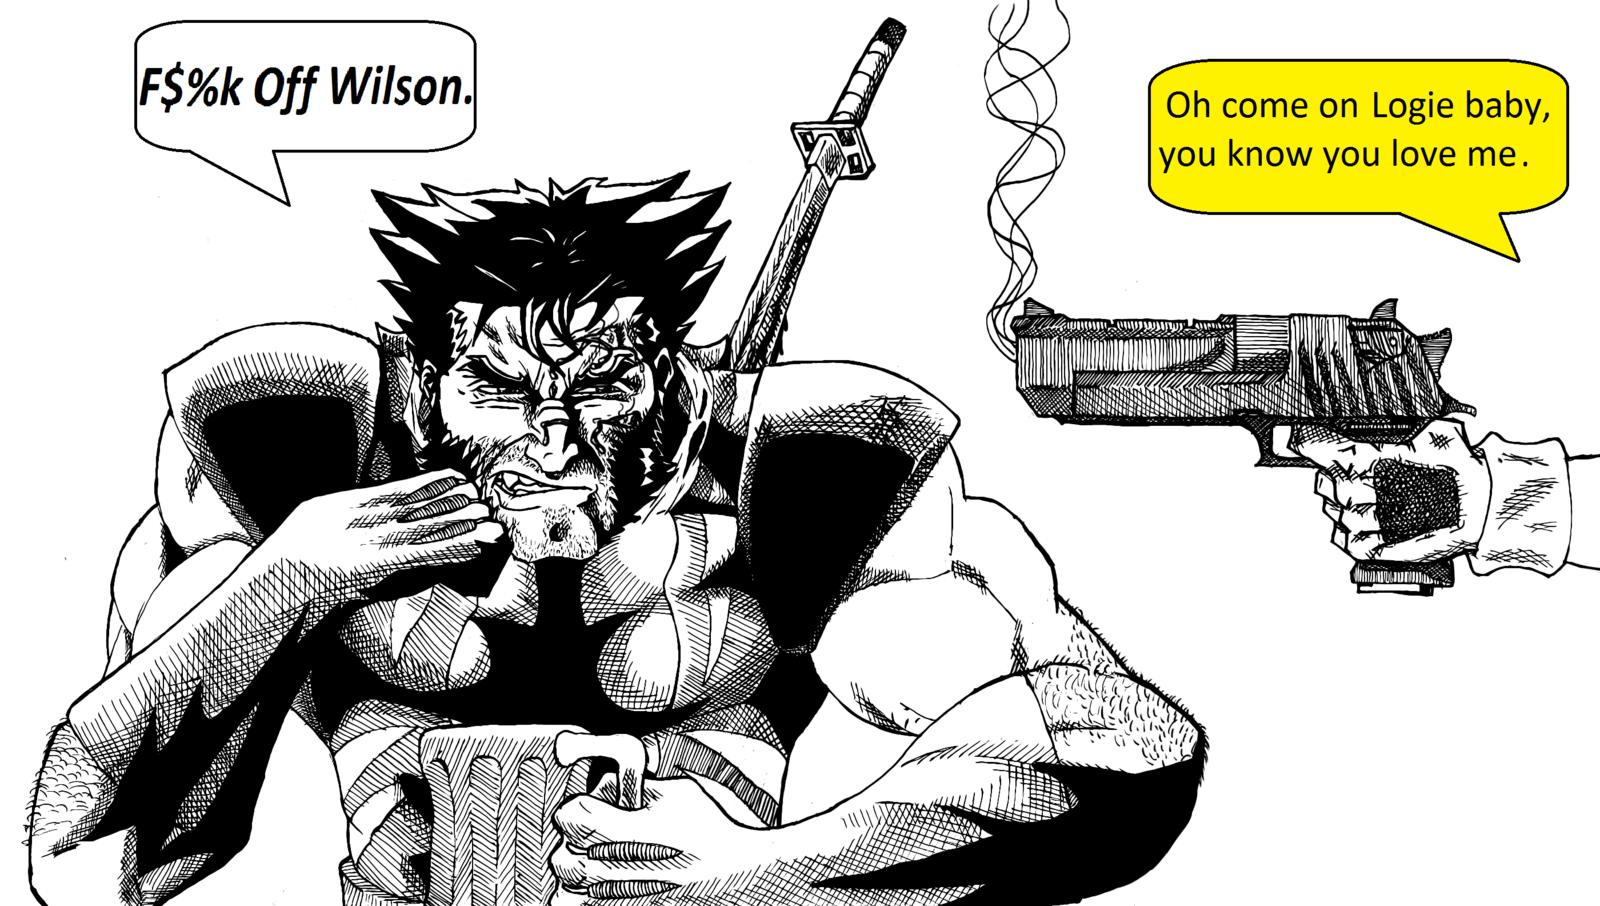 F$%k Off Wilson